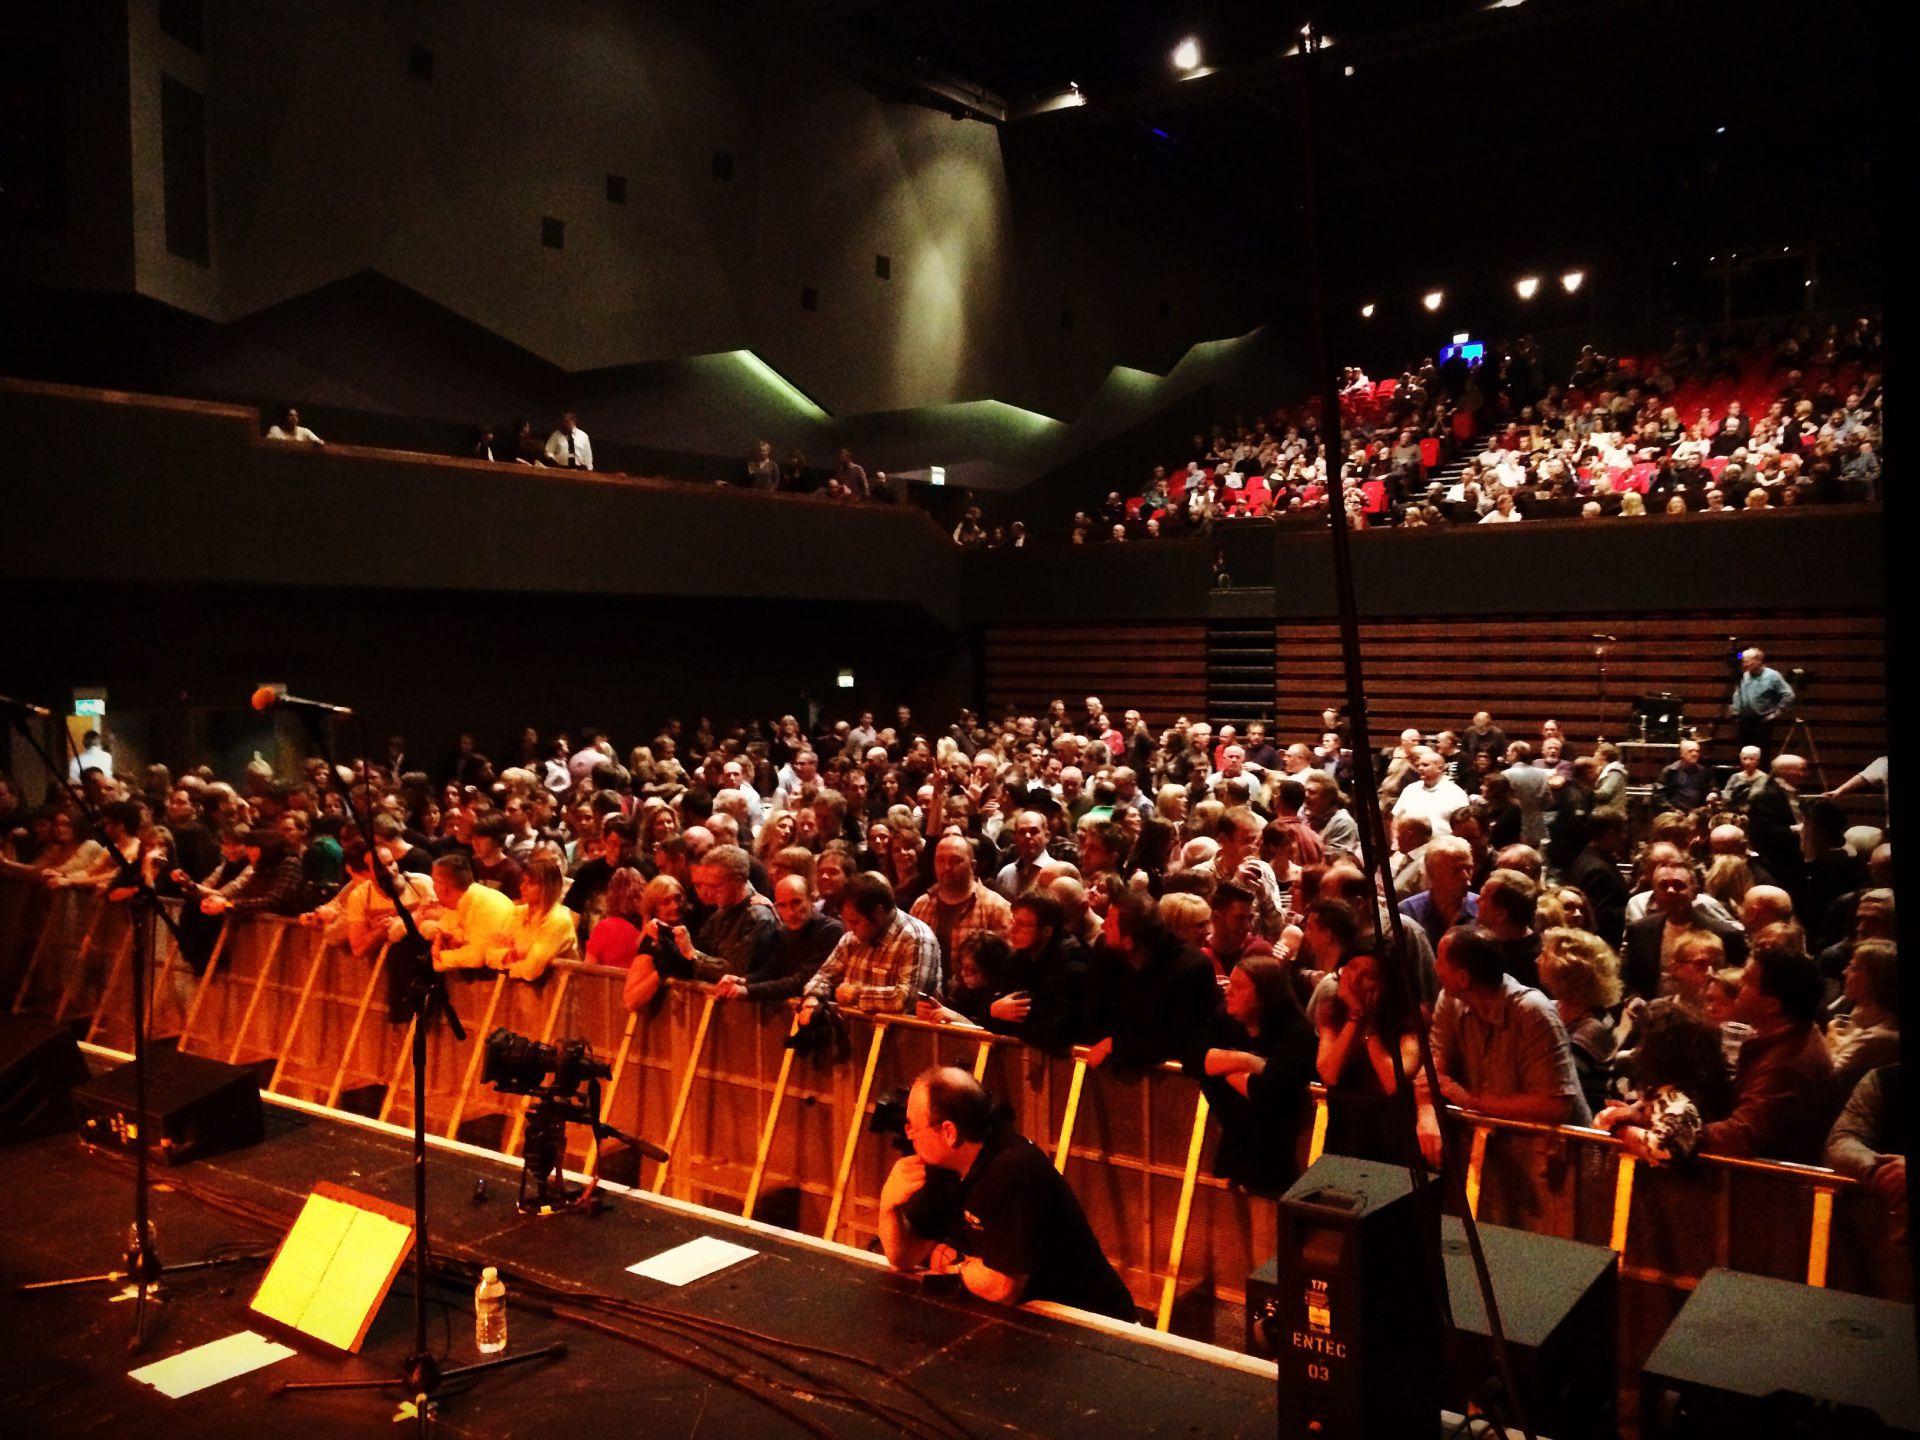 Spike Edney's SAS Band: Crowd